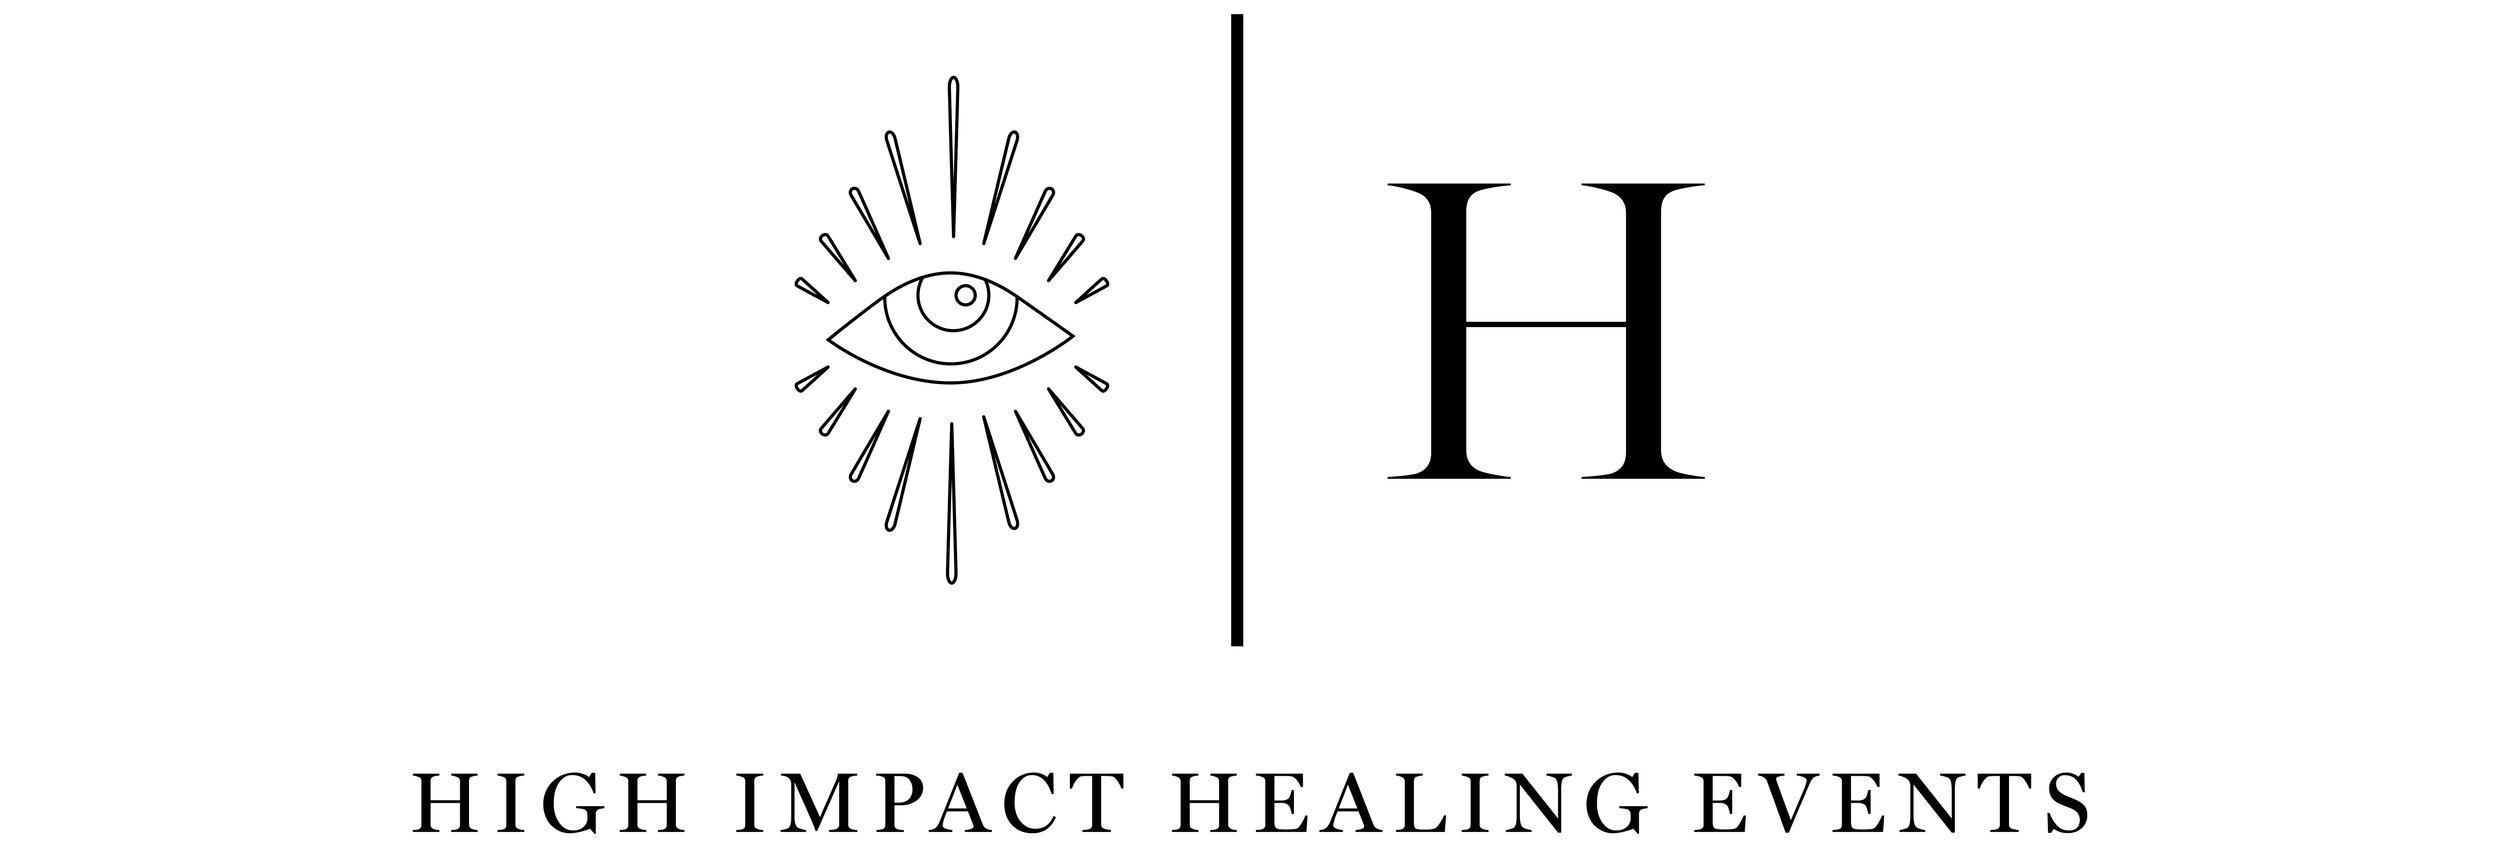 High-impact-healing-events_Logo_04.jpg